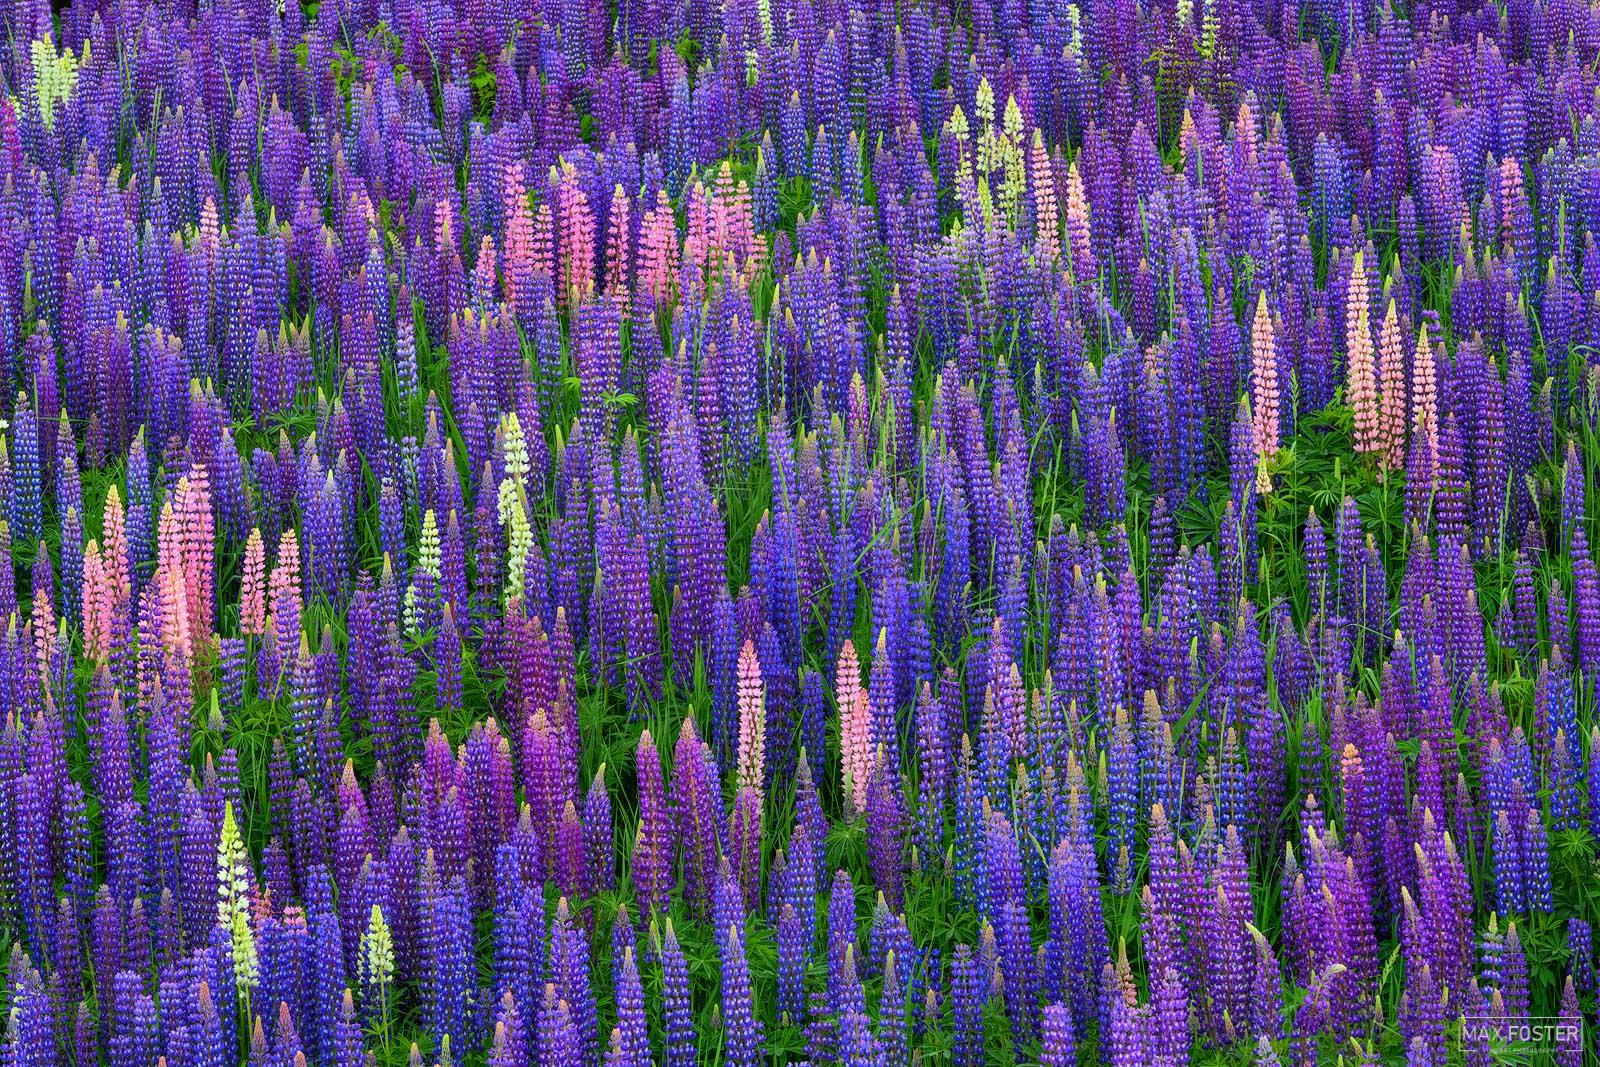 Two Harbors, Minnesota, Lupine, Flower, Scent of Summer, photo